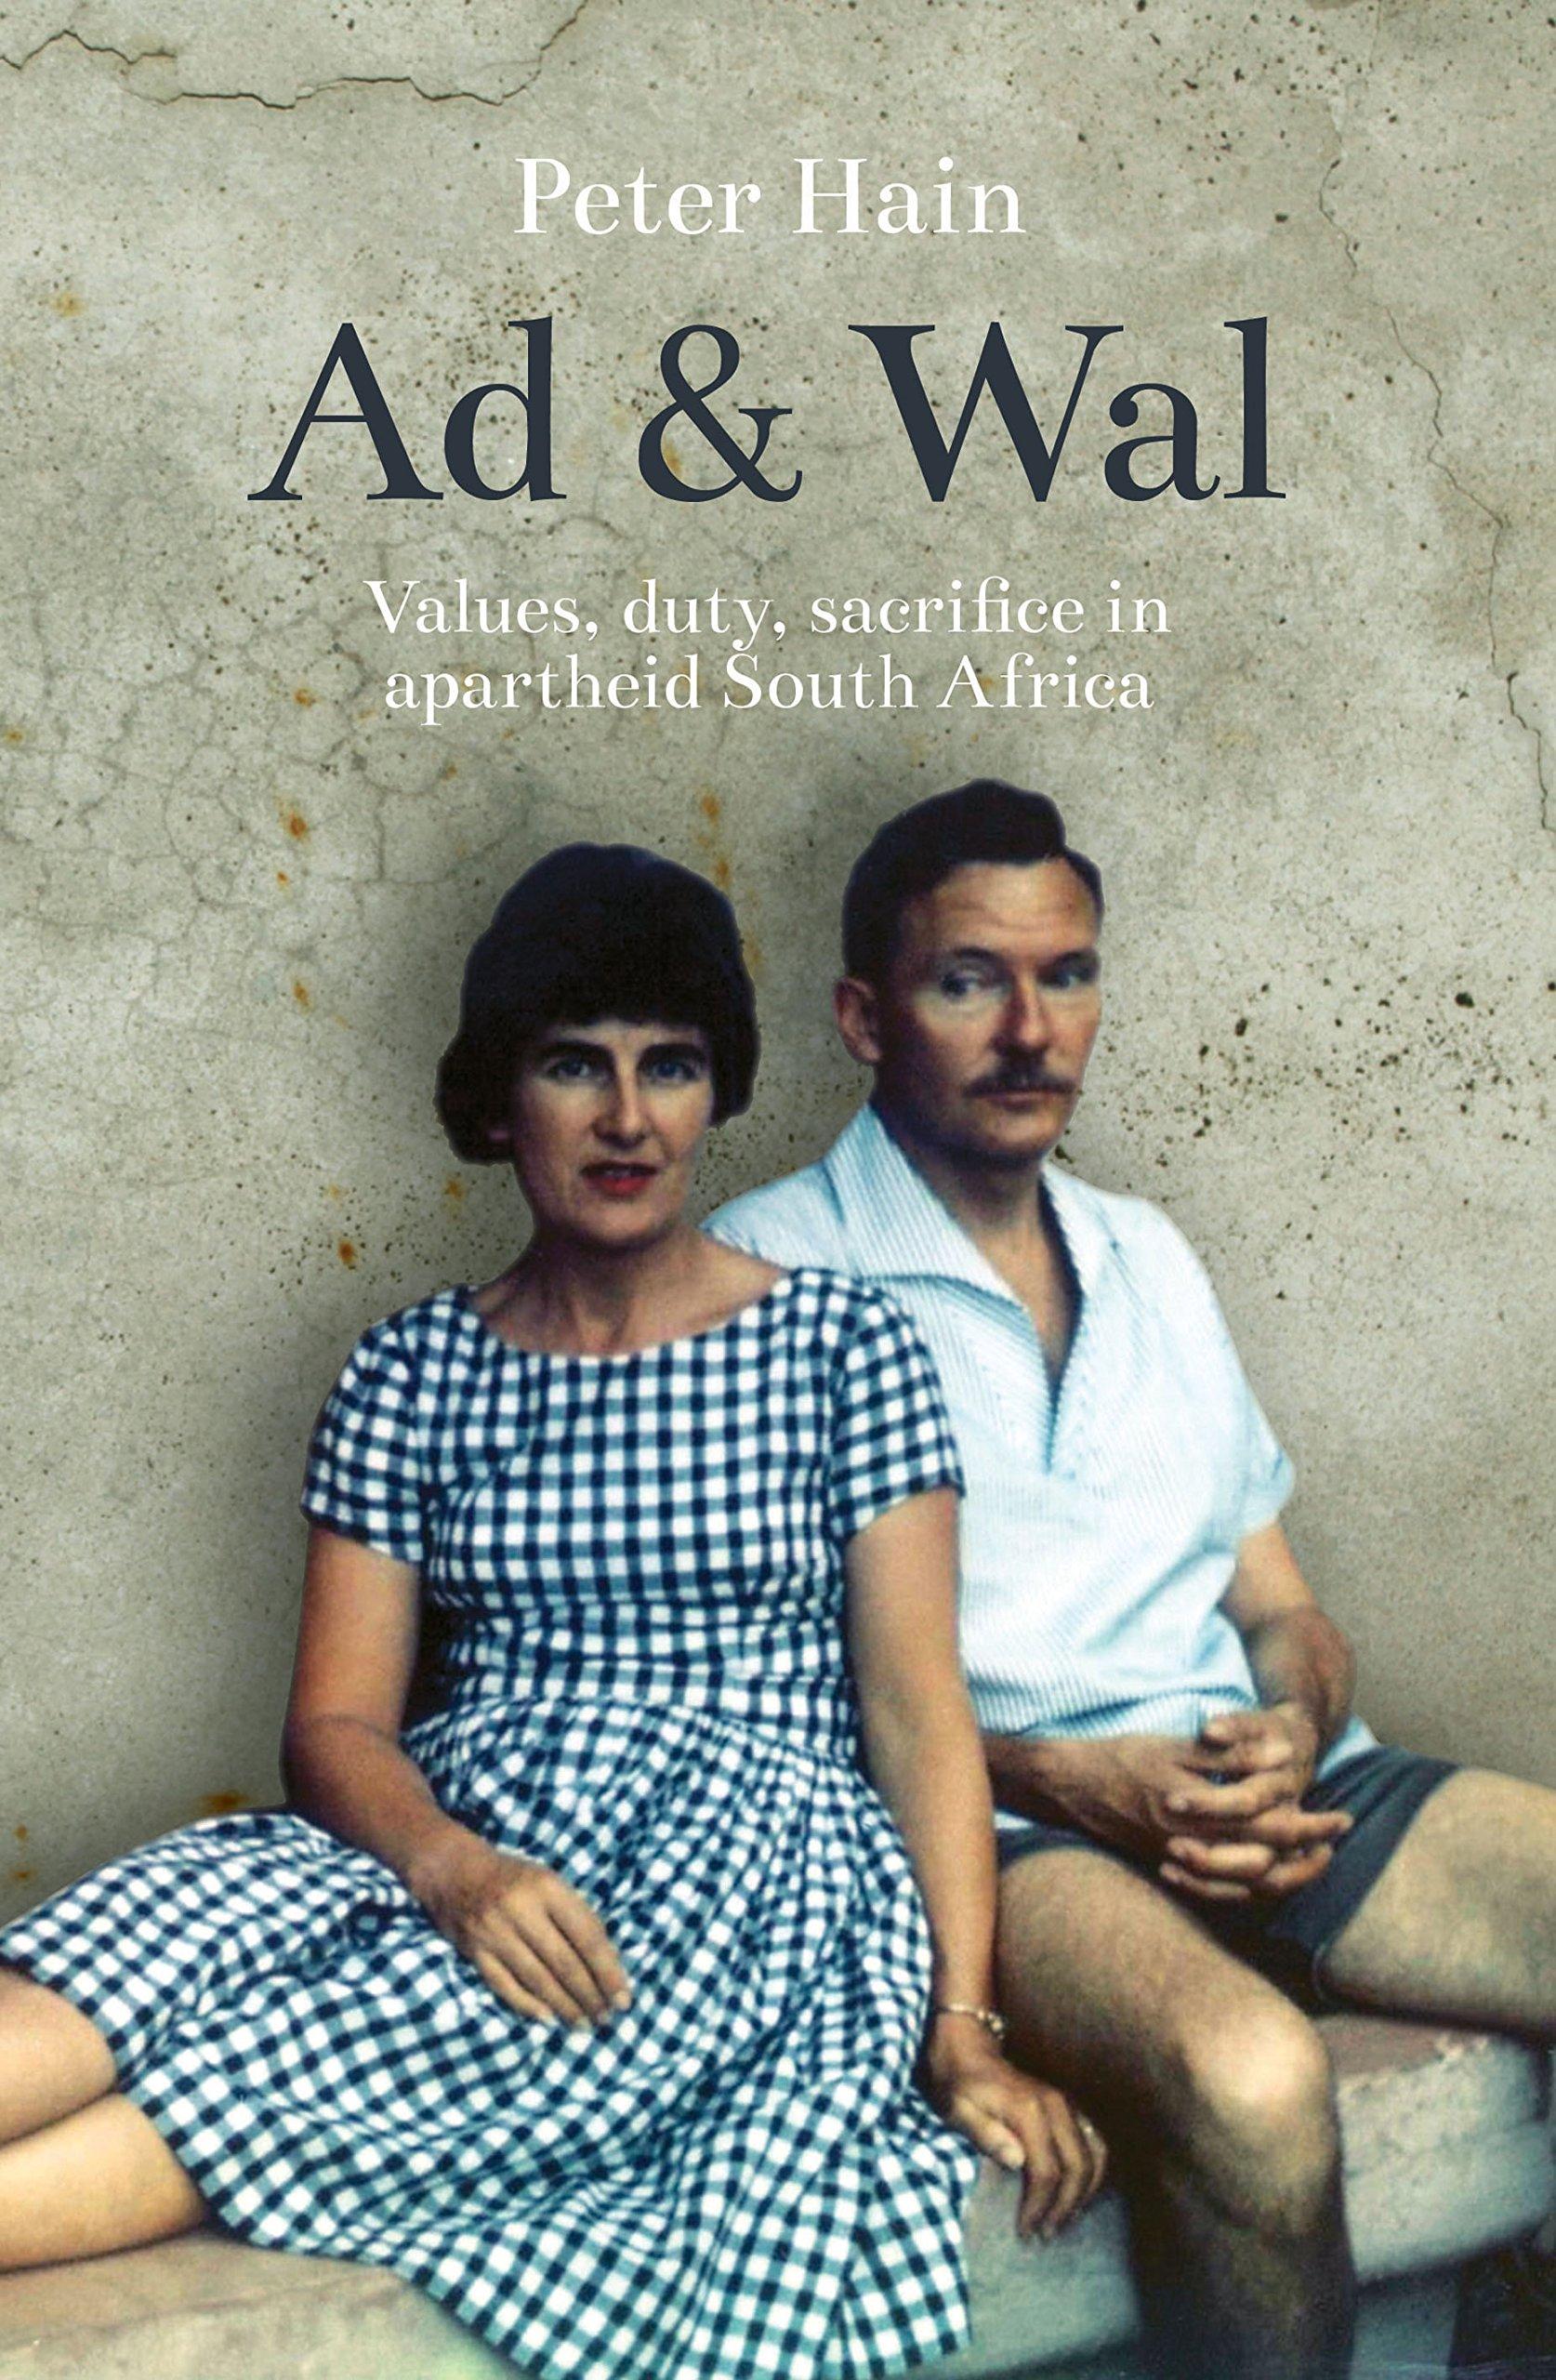 Ad and Wal: A Story of Values, Duty, Sacrifice PDF